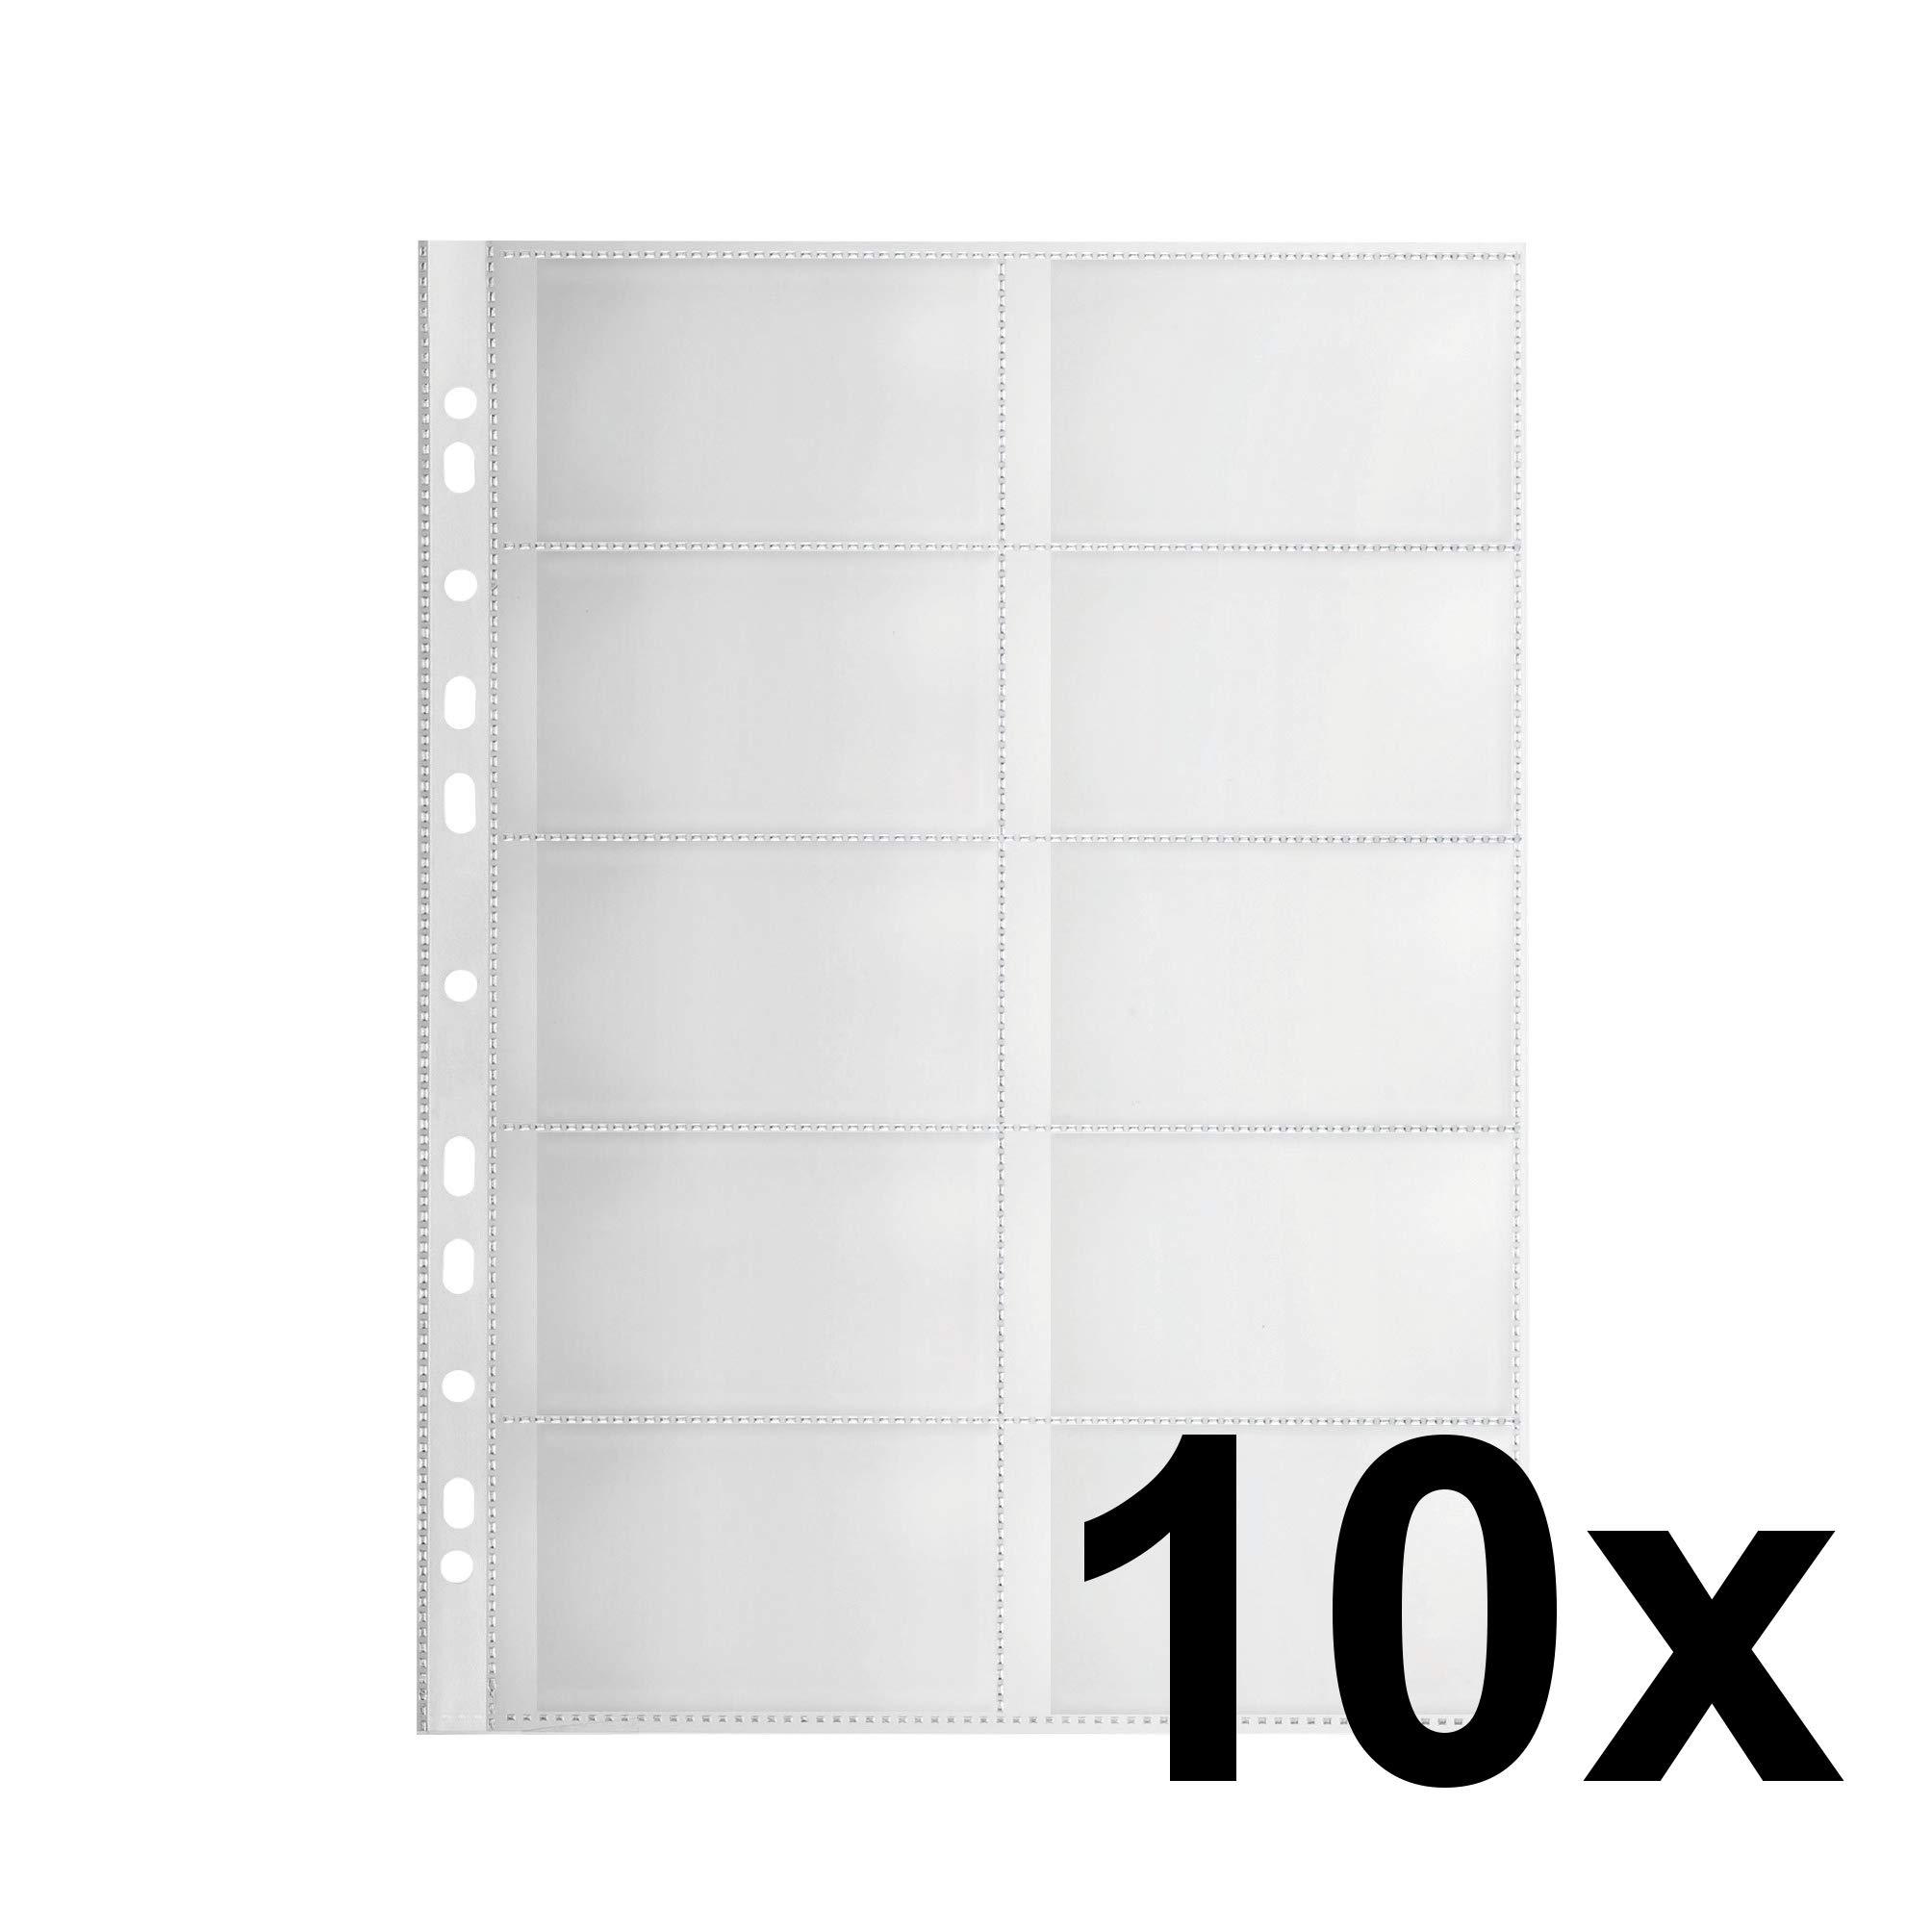 FALKEN Premium PP de plástico Fundas para tarjetas de visita para DIN A4 transparente granulada con